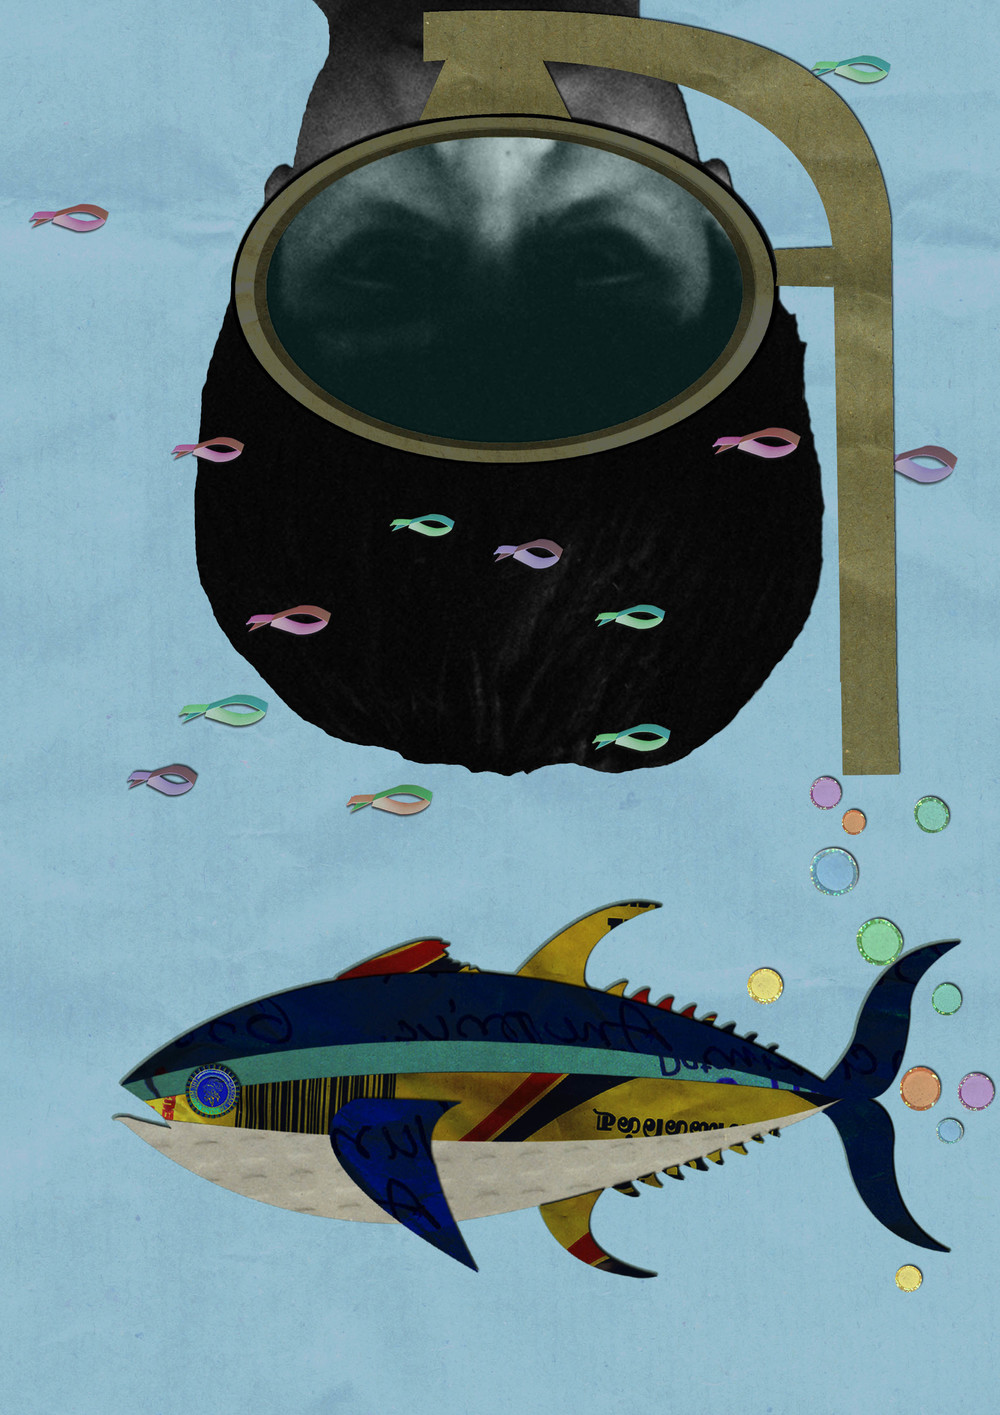 015_spinning sardine.jpg